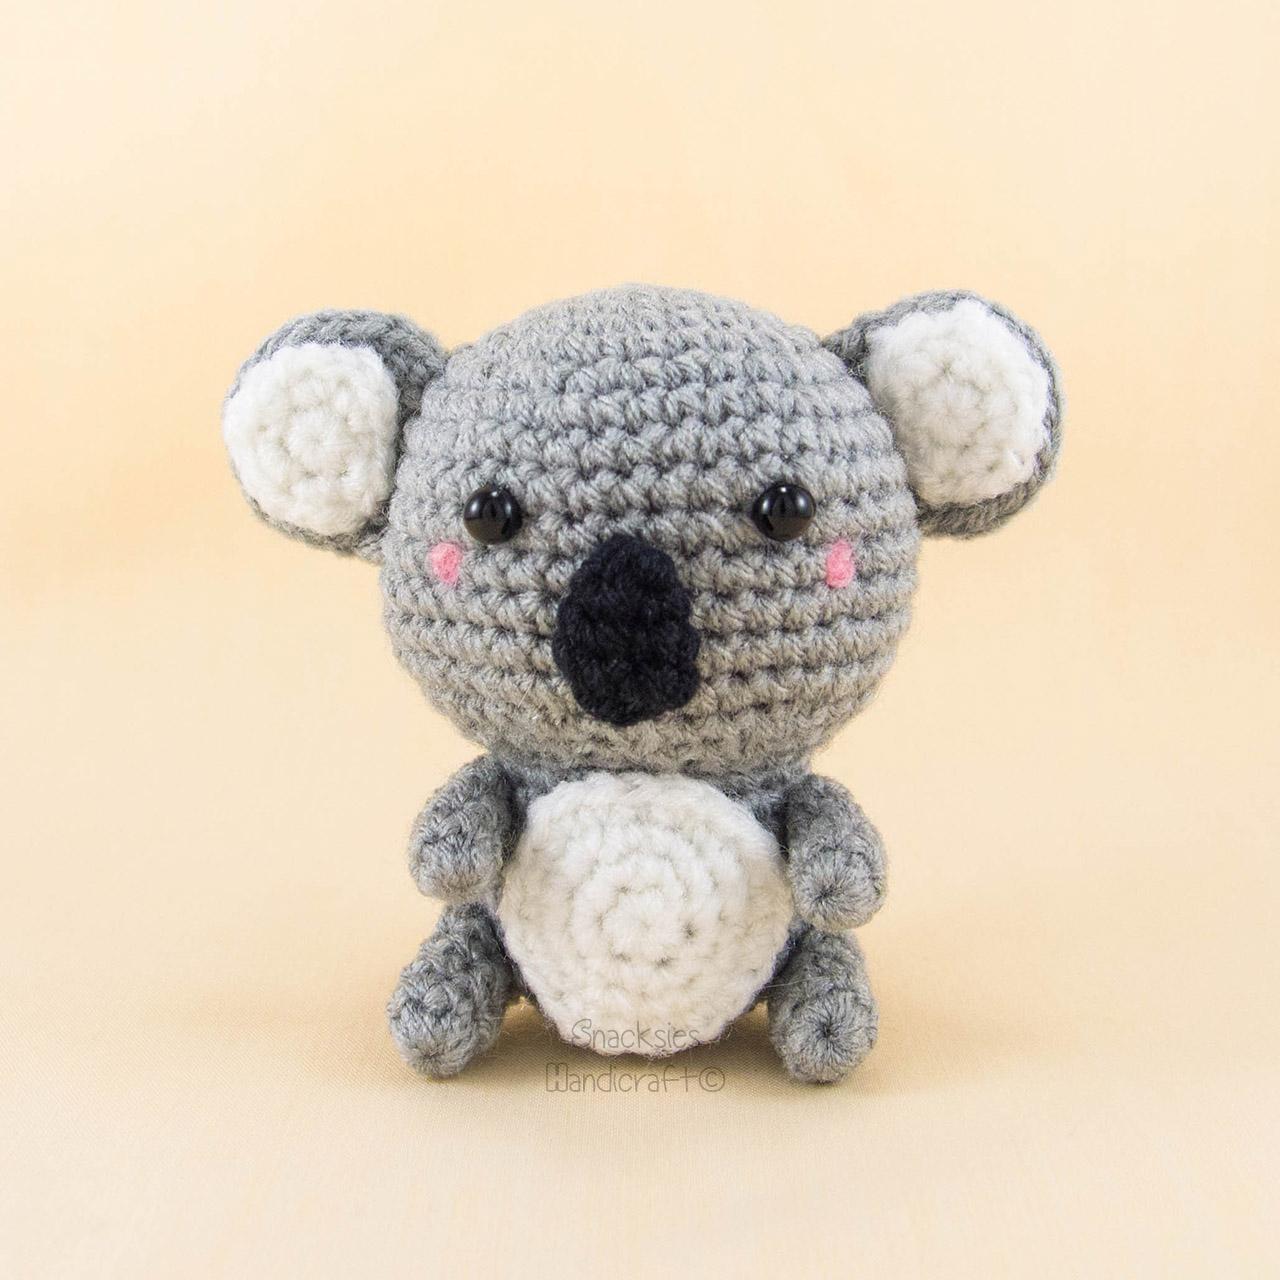 Crochet Pattern Koala Bear : Koala Bear Amigurumi ~ Snacksies Handicraft Corner